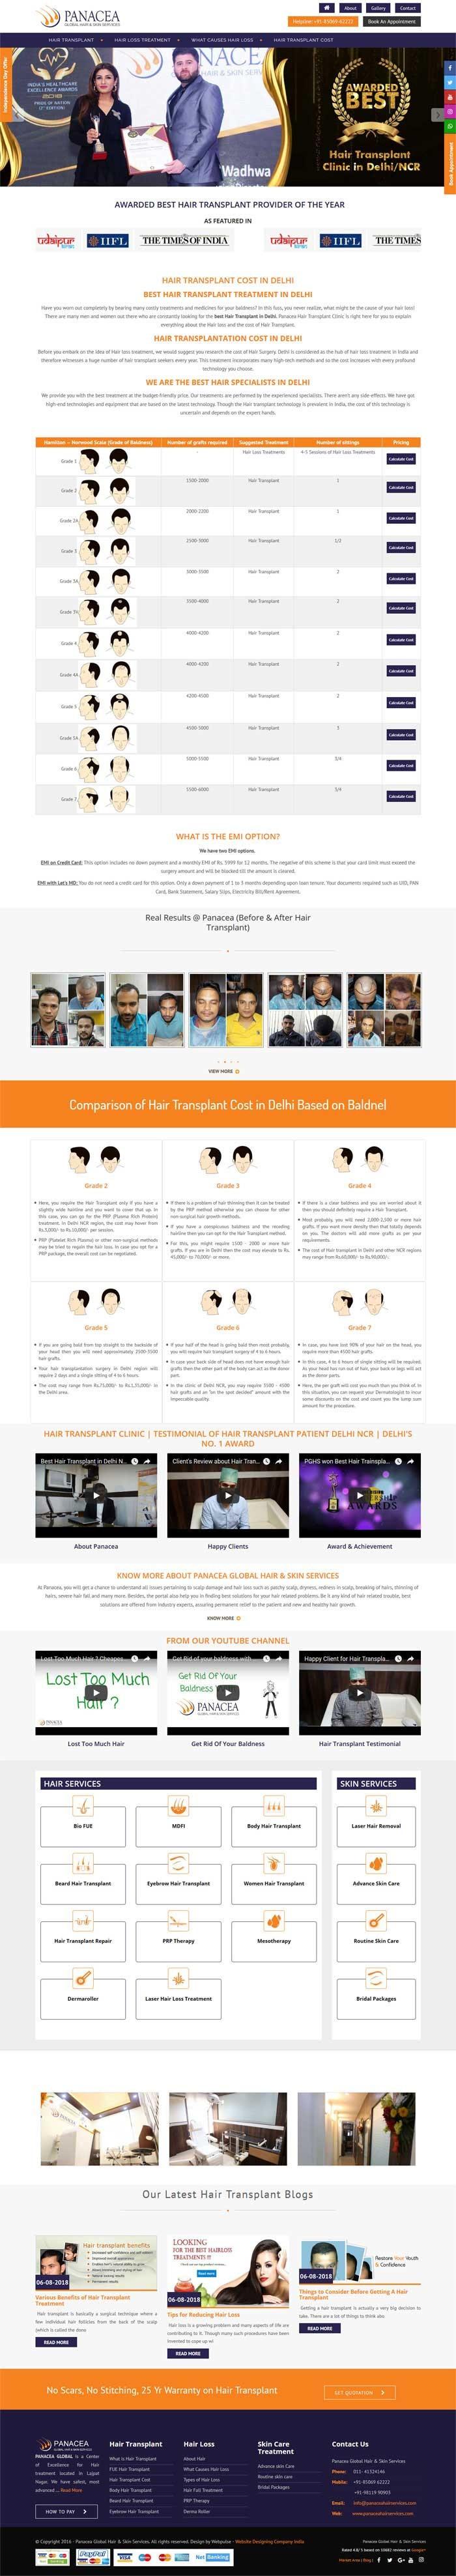 Panacea Global Hair Services